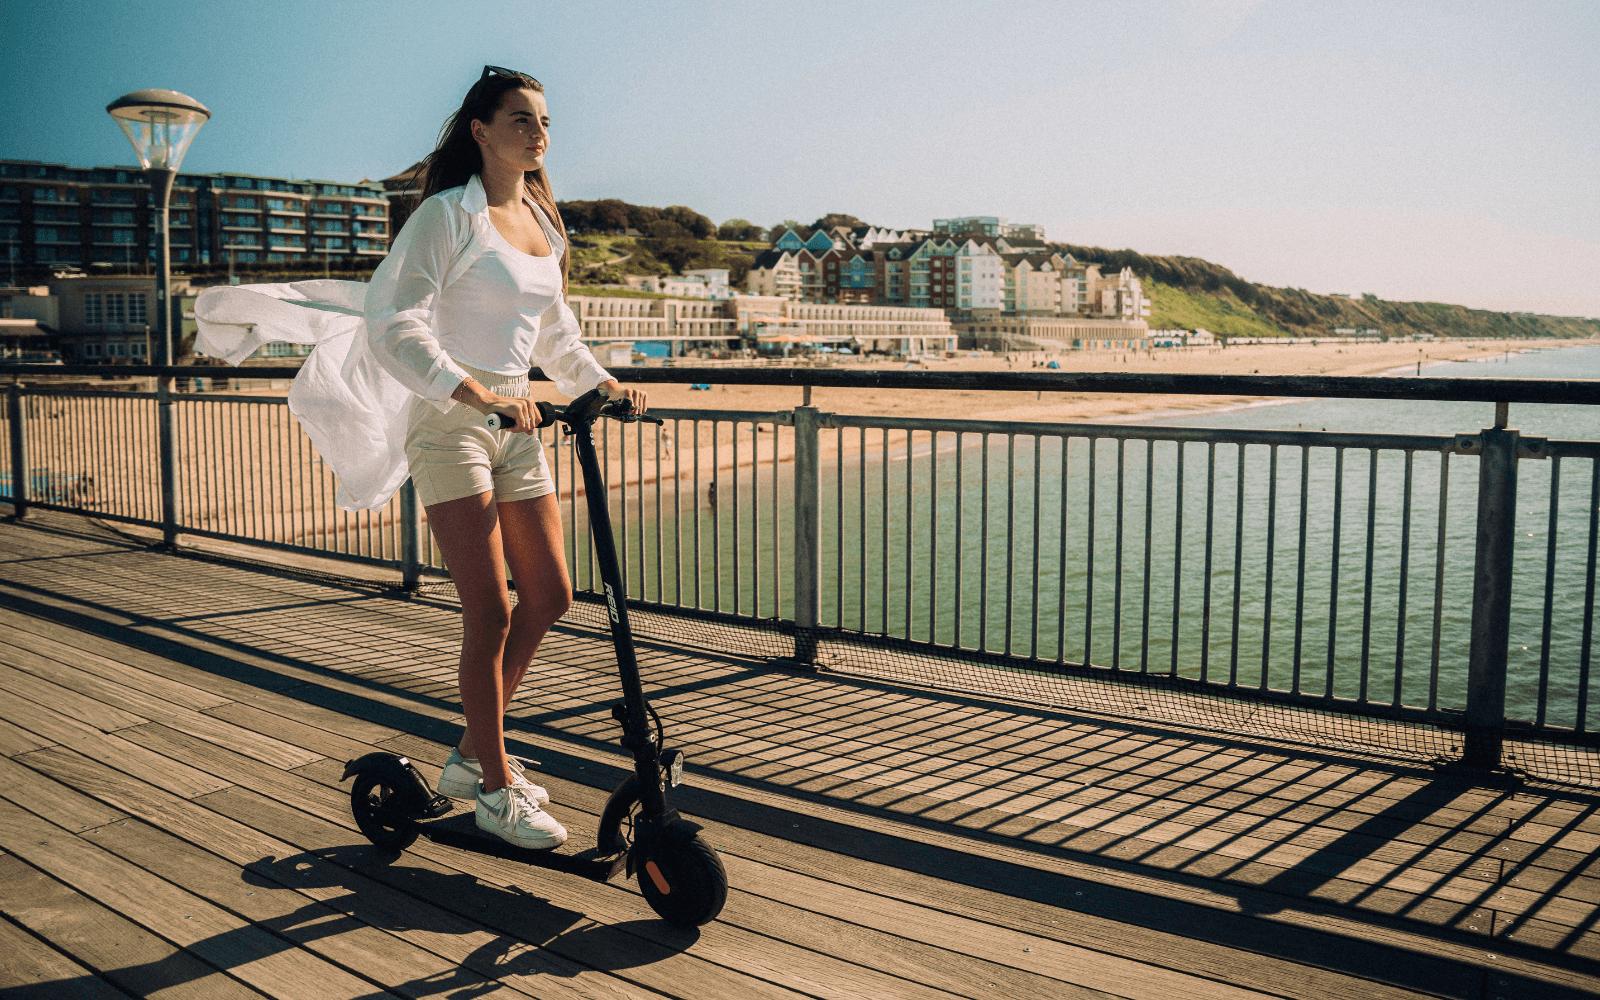 9 24 - Reid ® - Glide eScooter